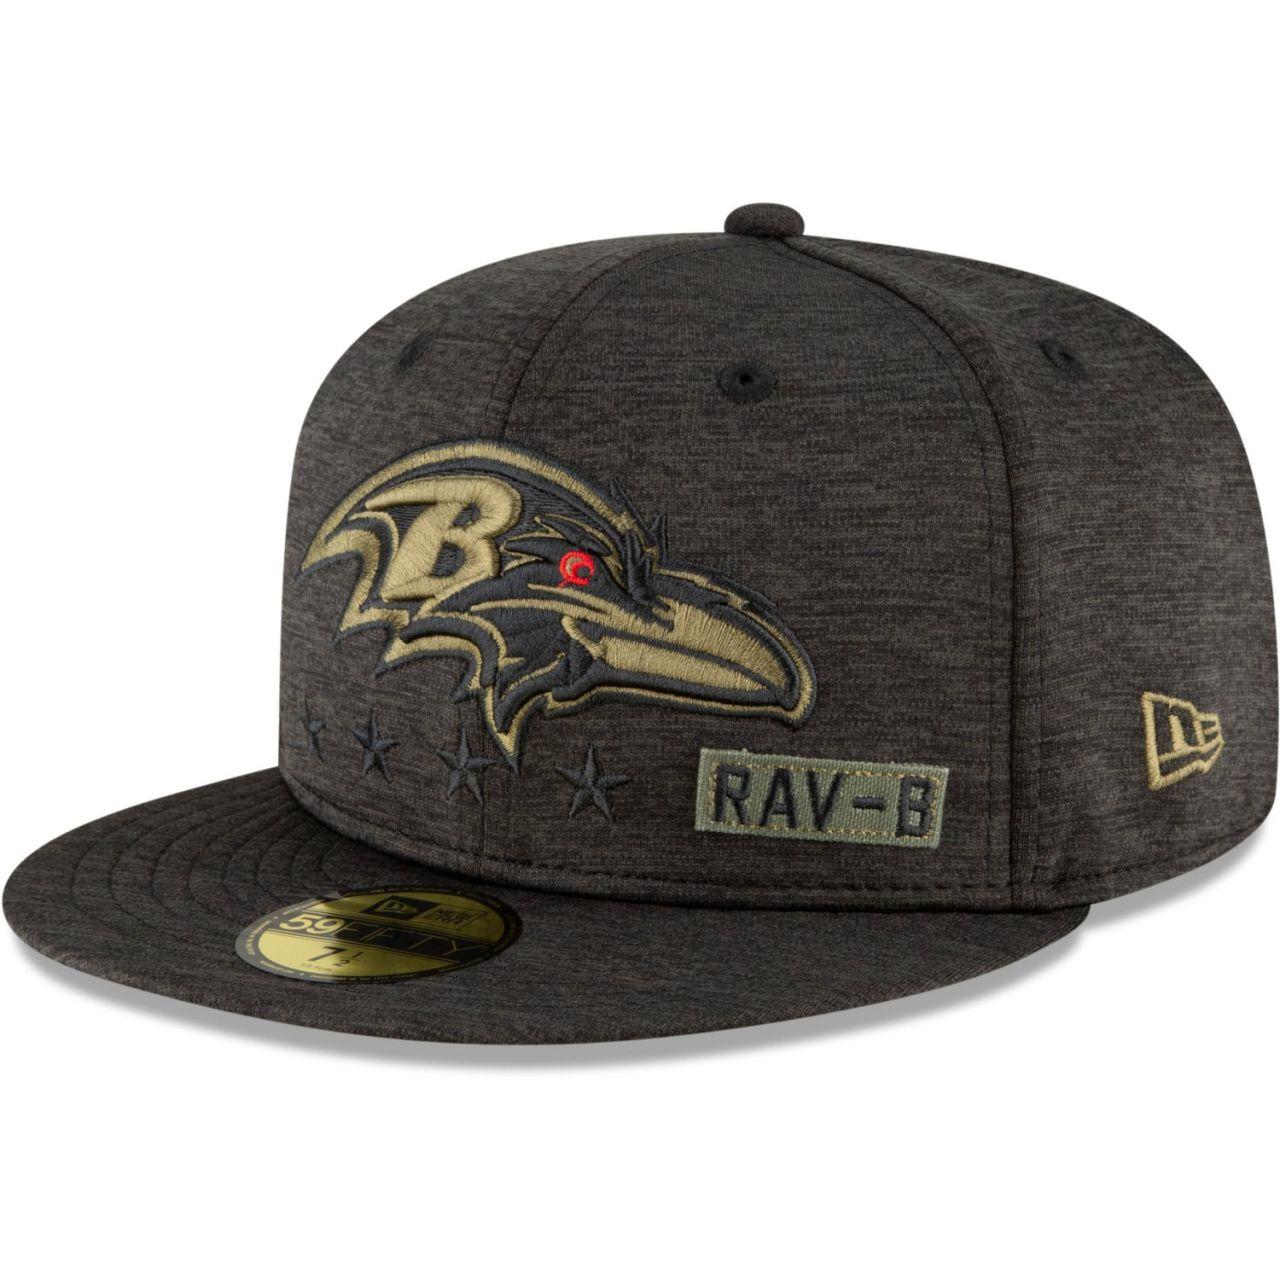 amfoo - New Era 59FIFTY Cap Salute to Service NFL Baltimore Ravens